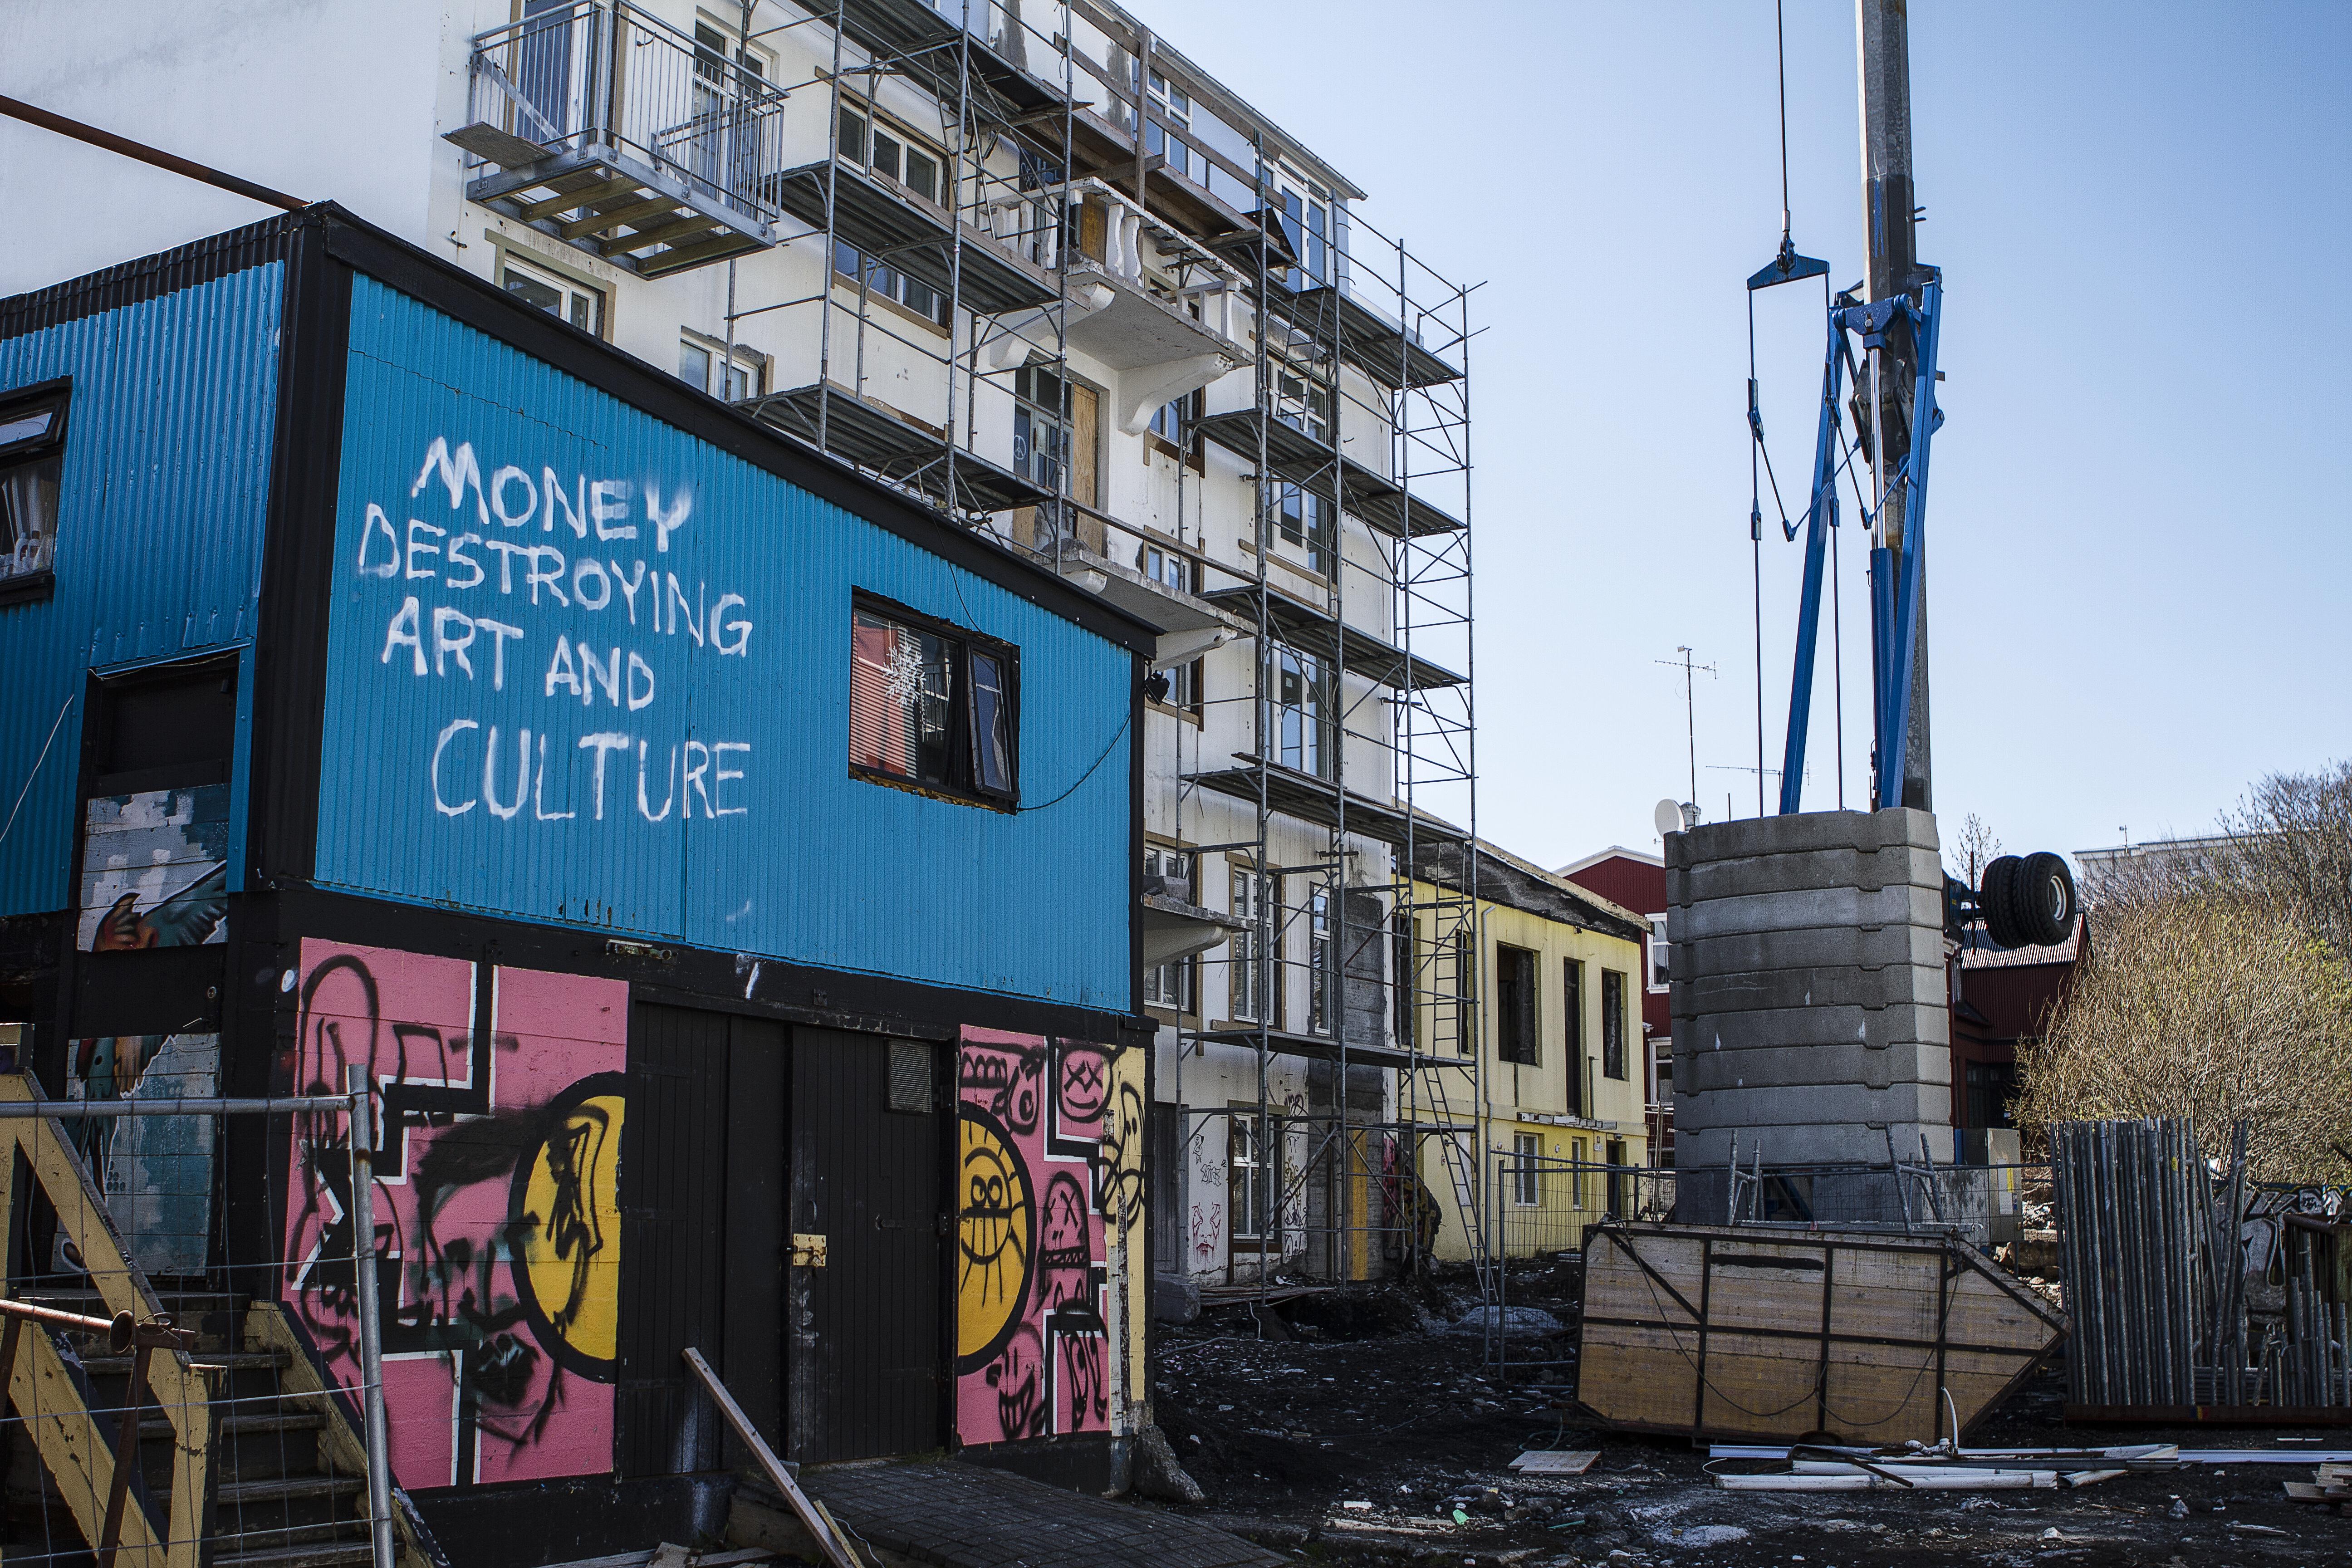 Reykjavik art objection